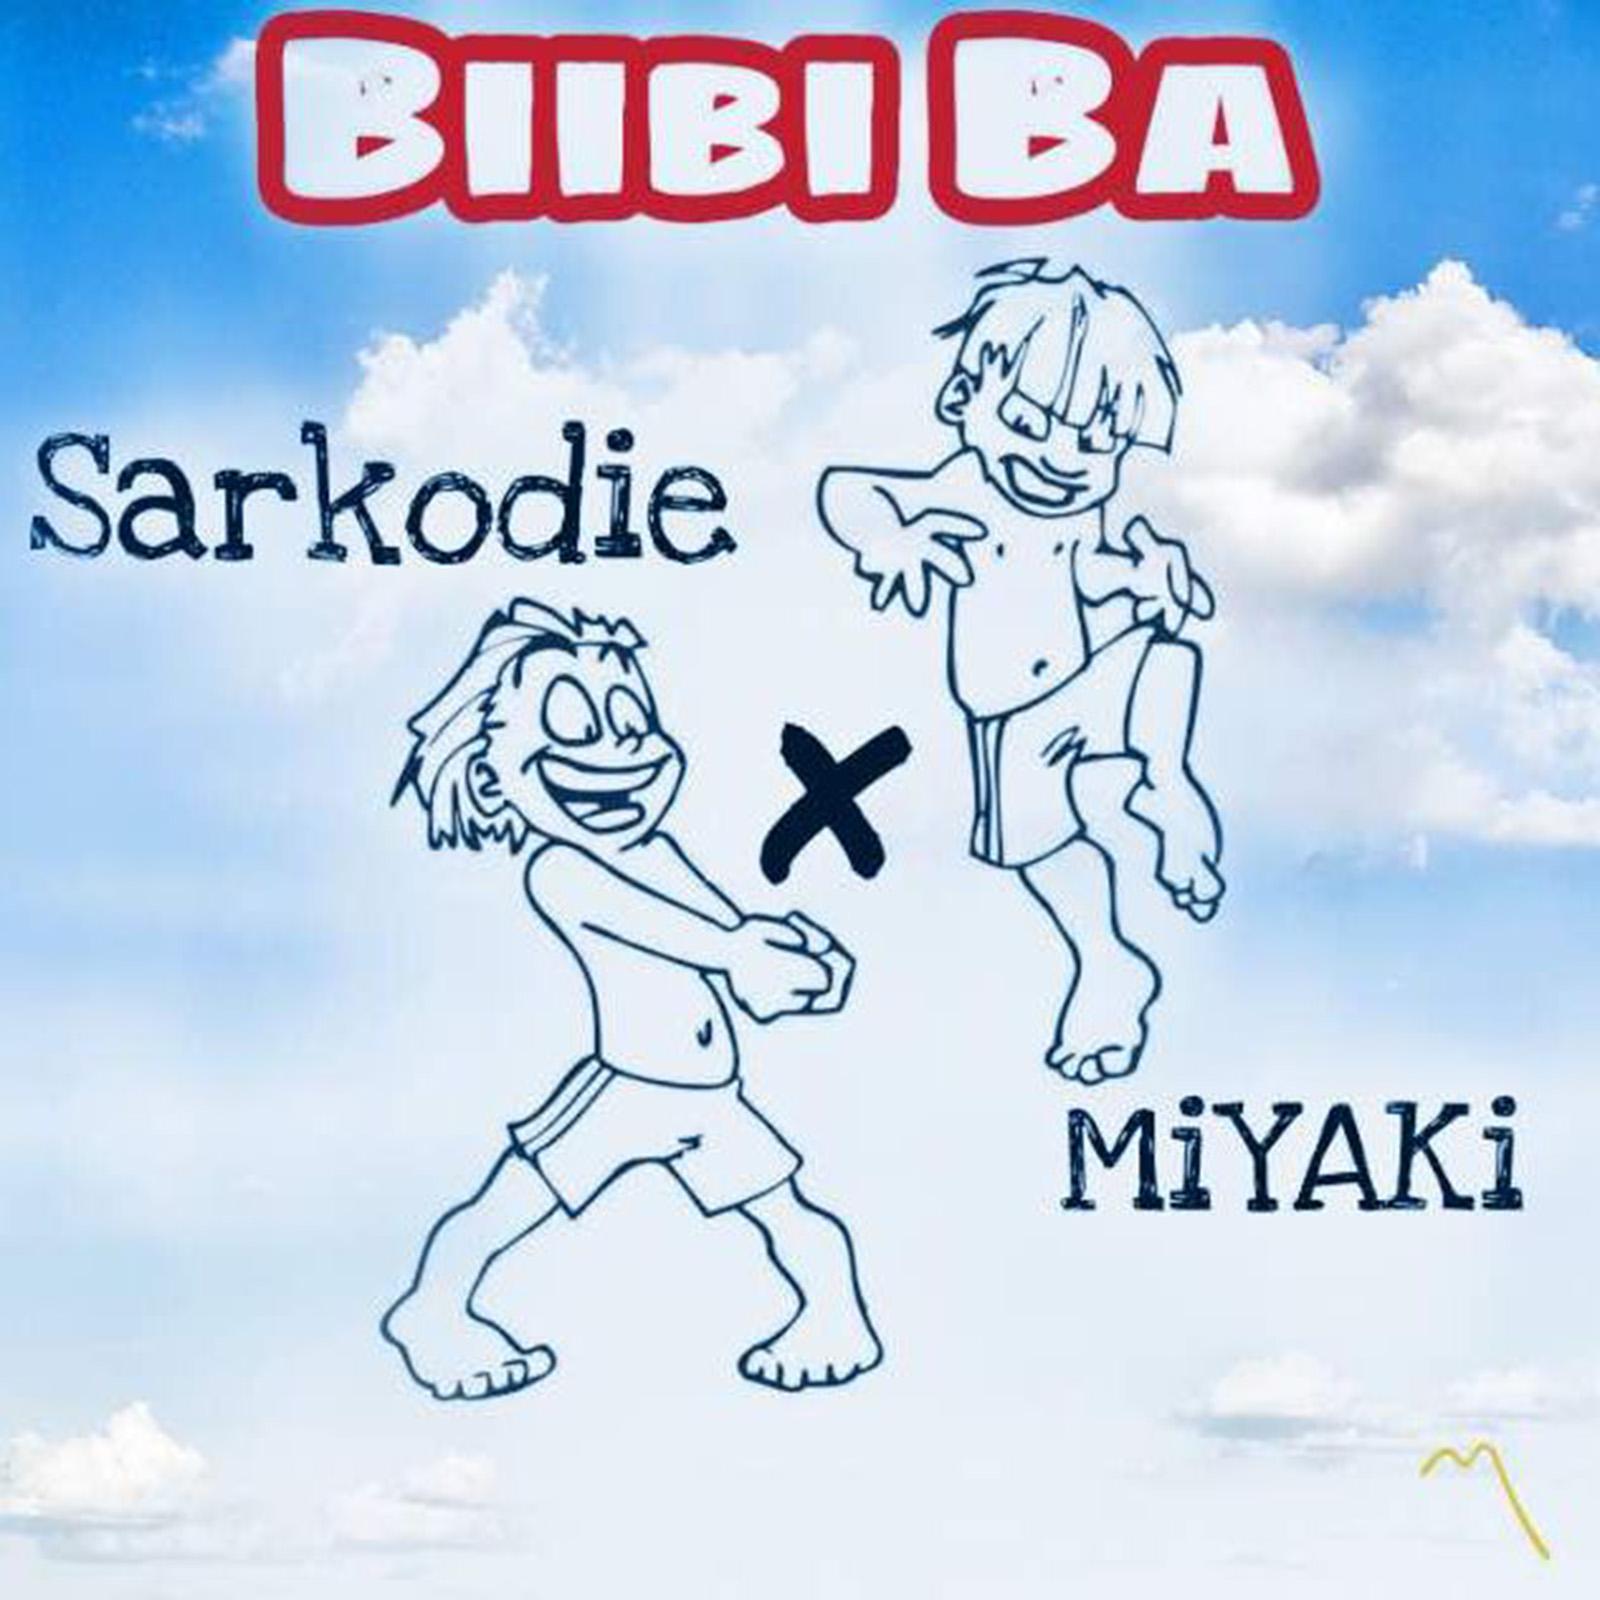 Biibi Ba by MiYAKi & Sarkodie